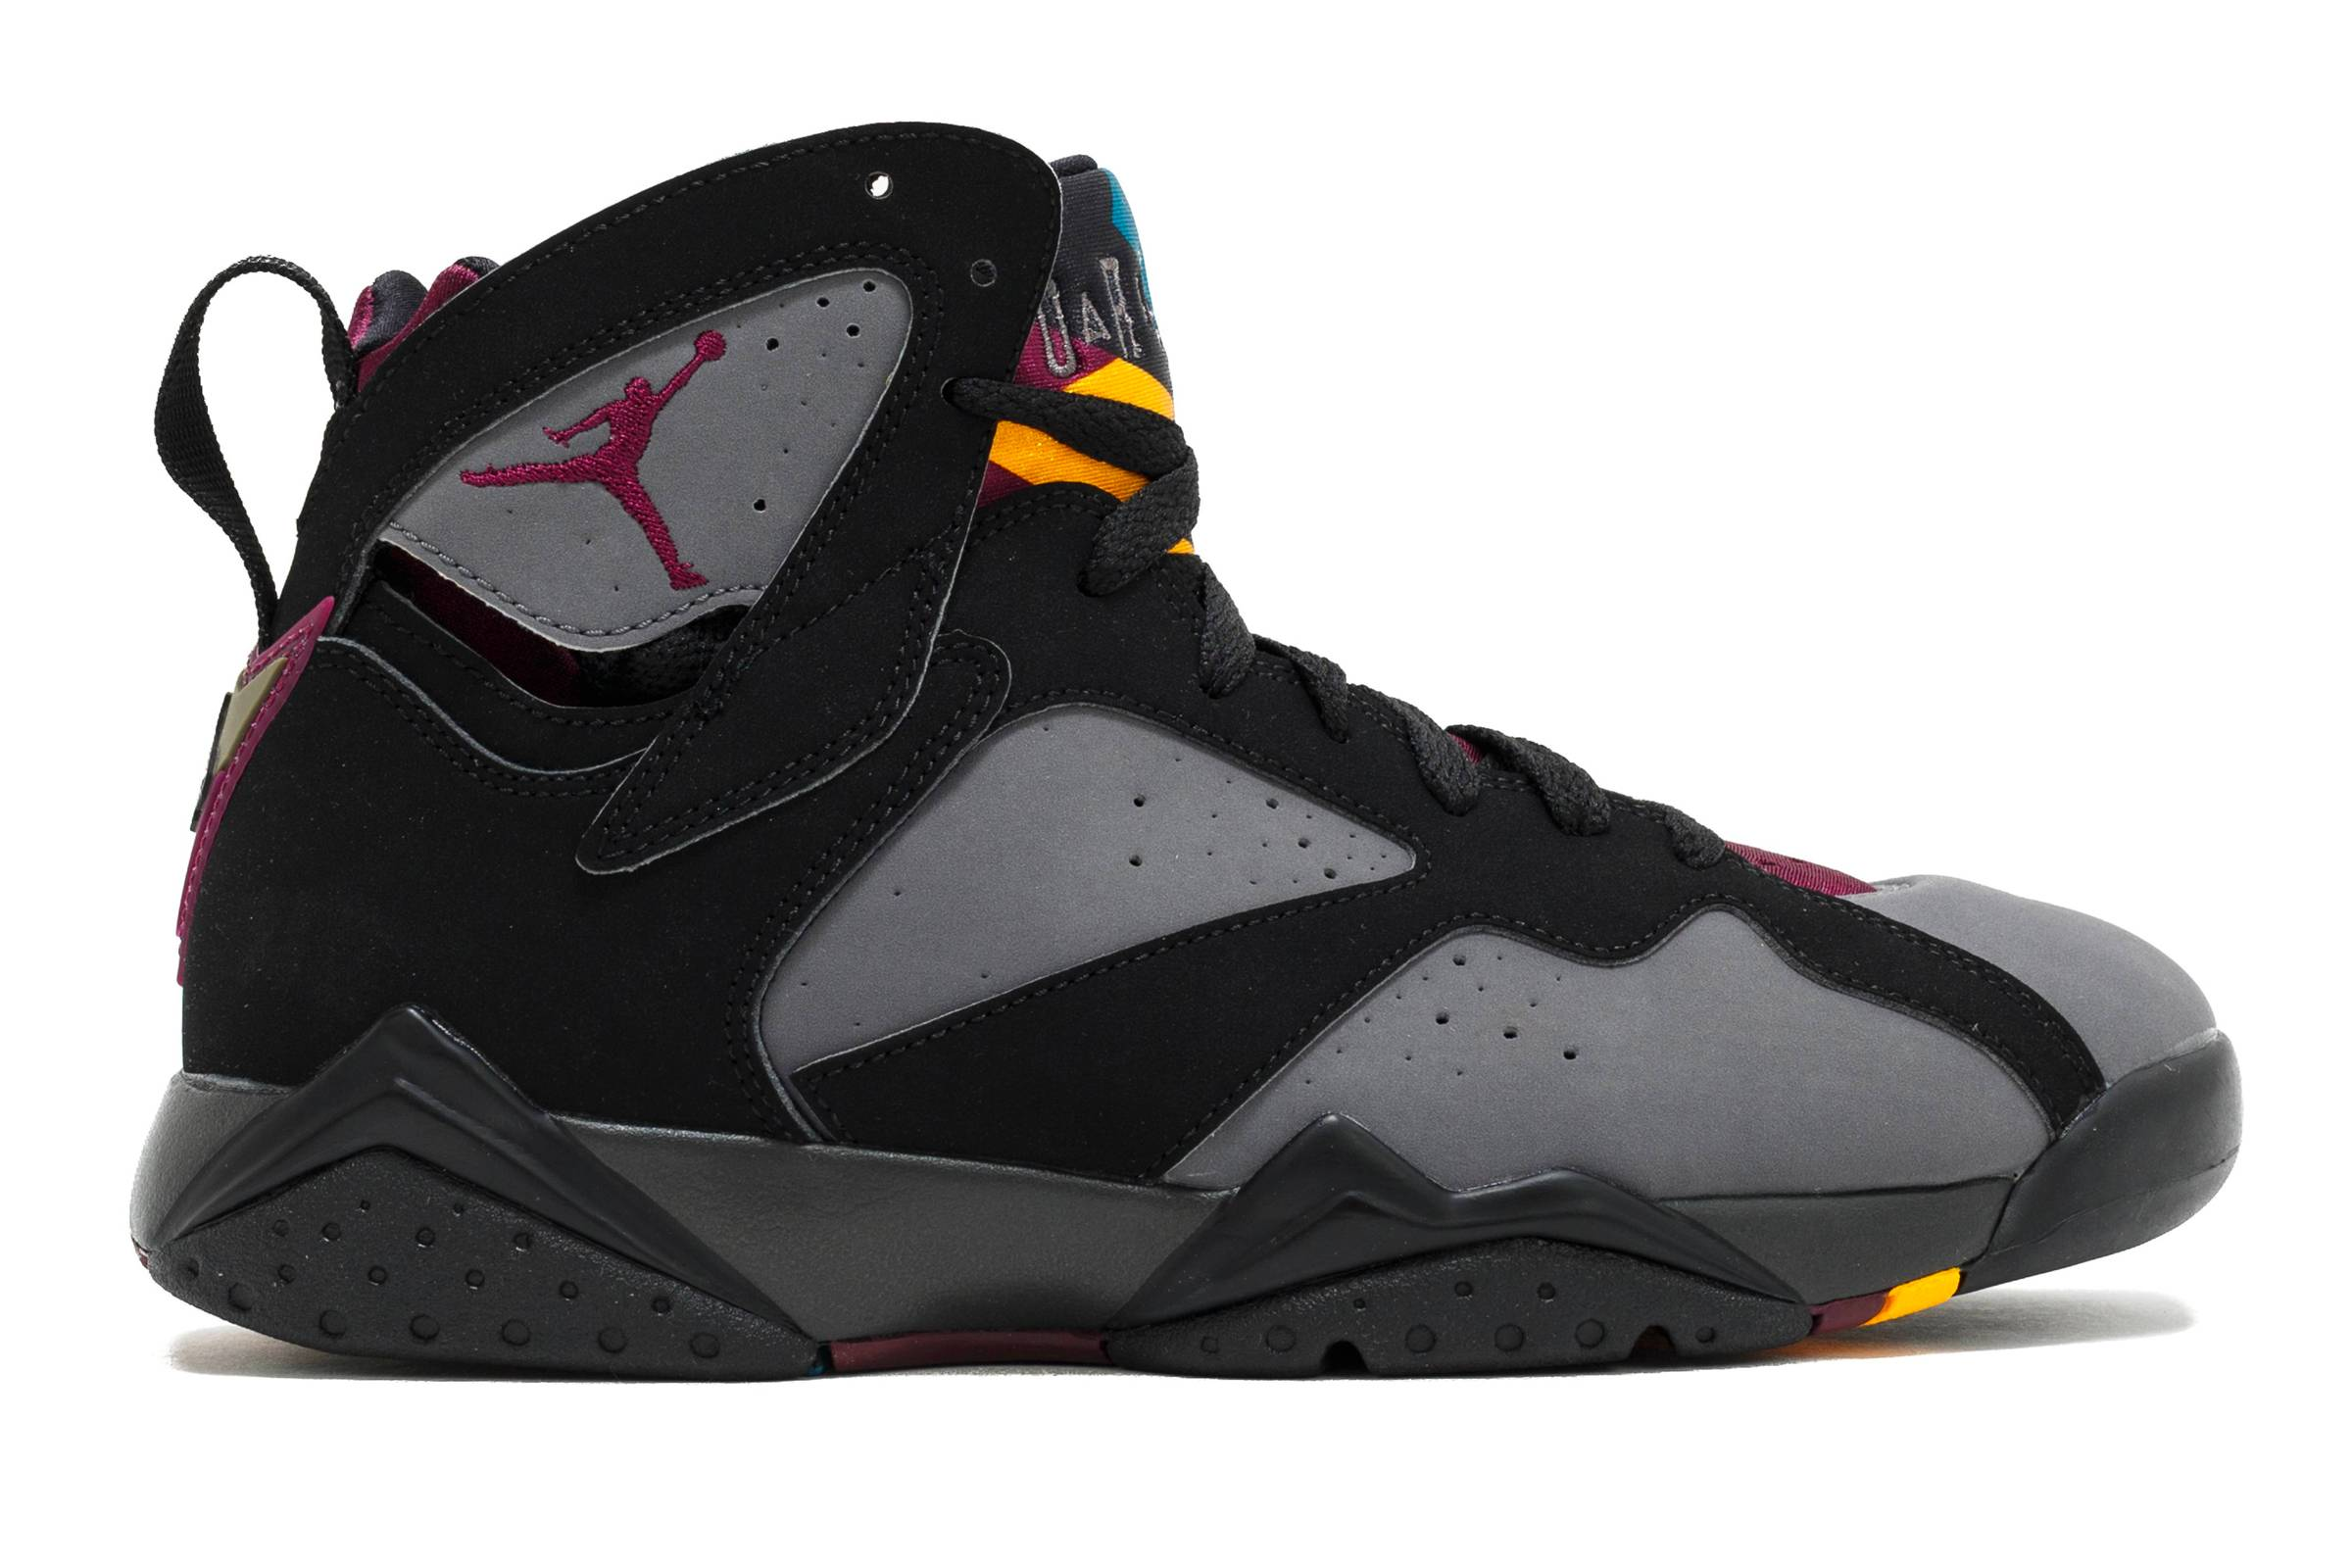 Jordan VII Bordeaux